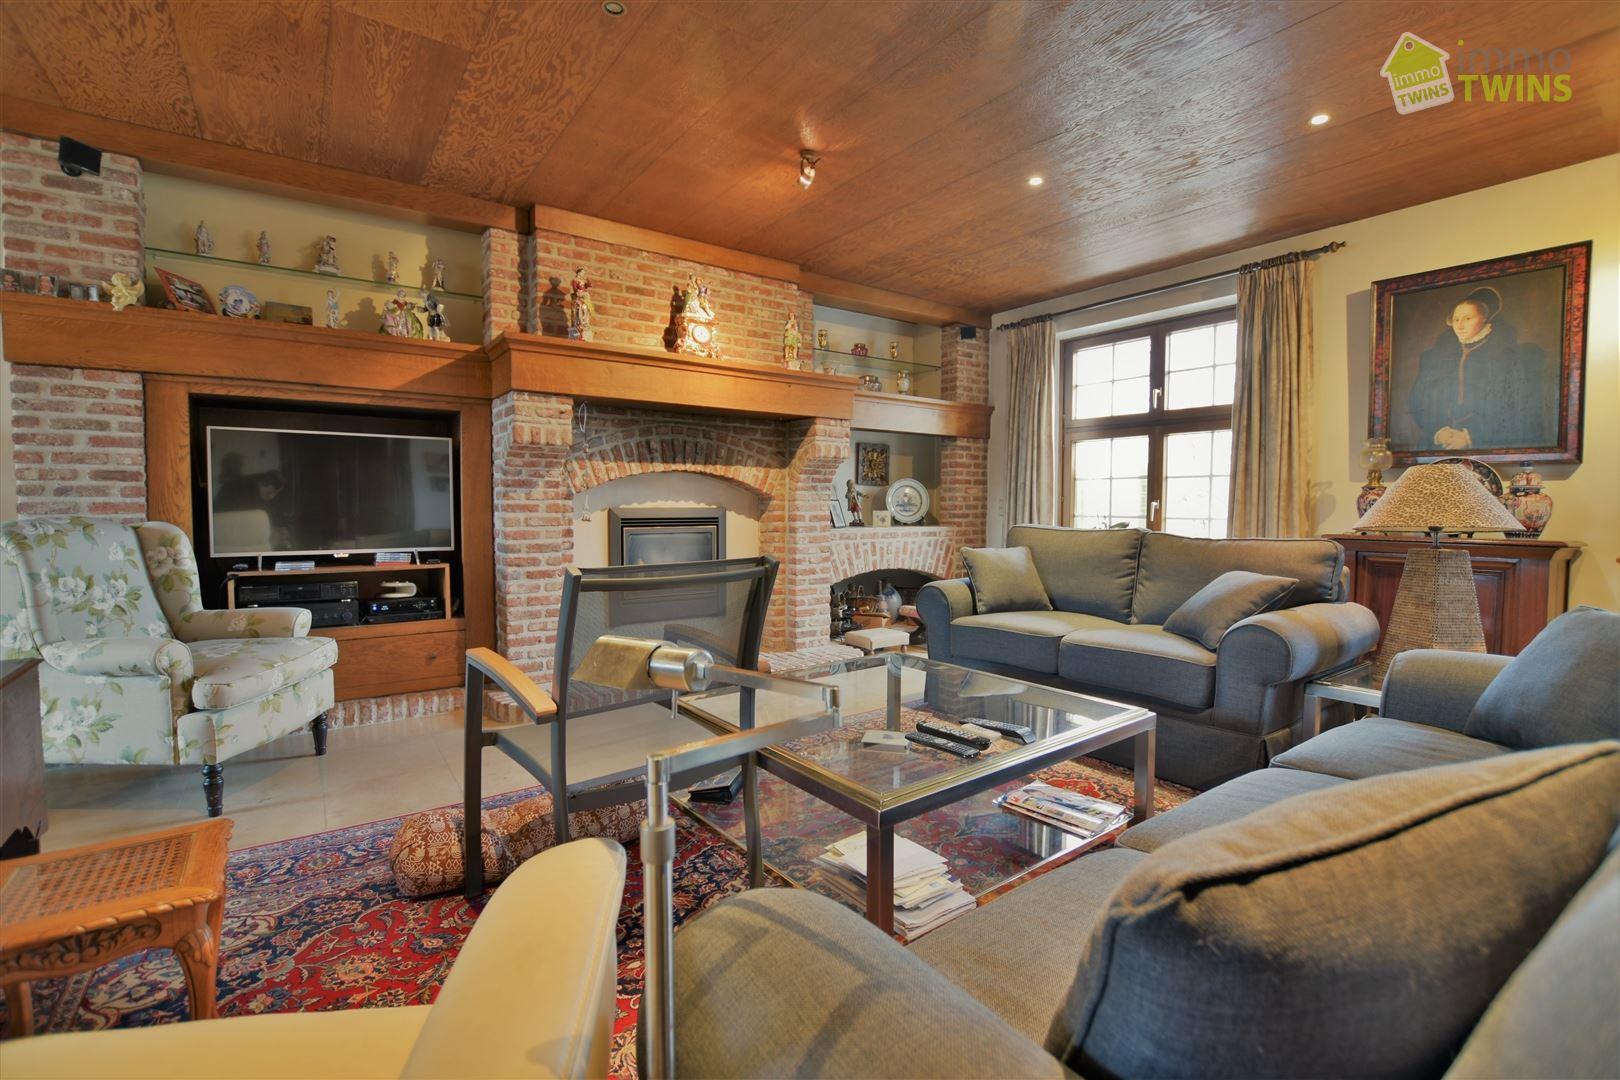 Foto 13 : Duplex/triplex te 9200 Dendermonde (België) - Prijs € 398.000